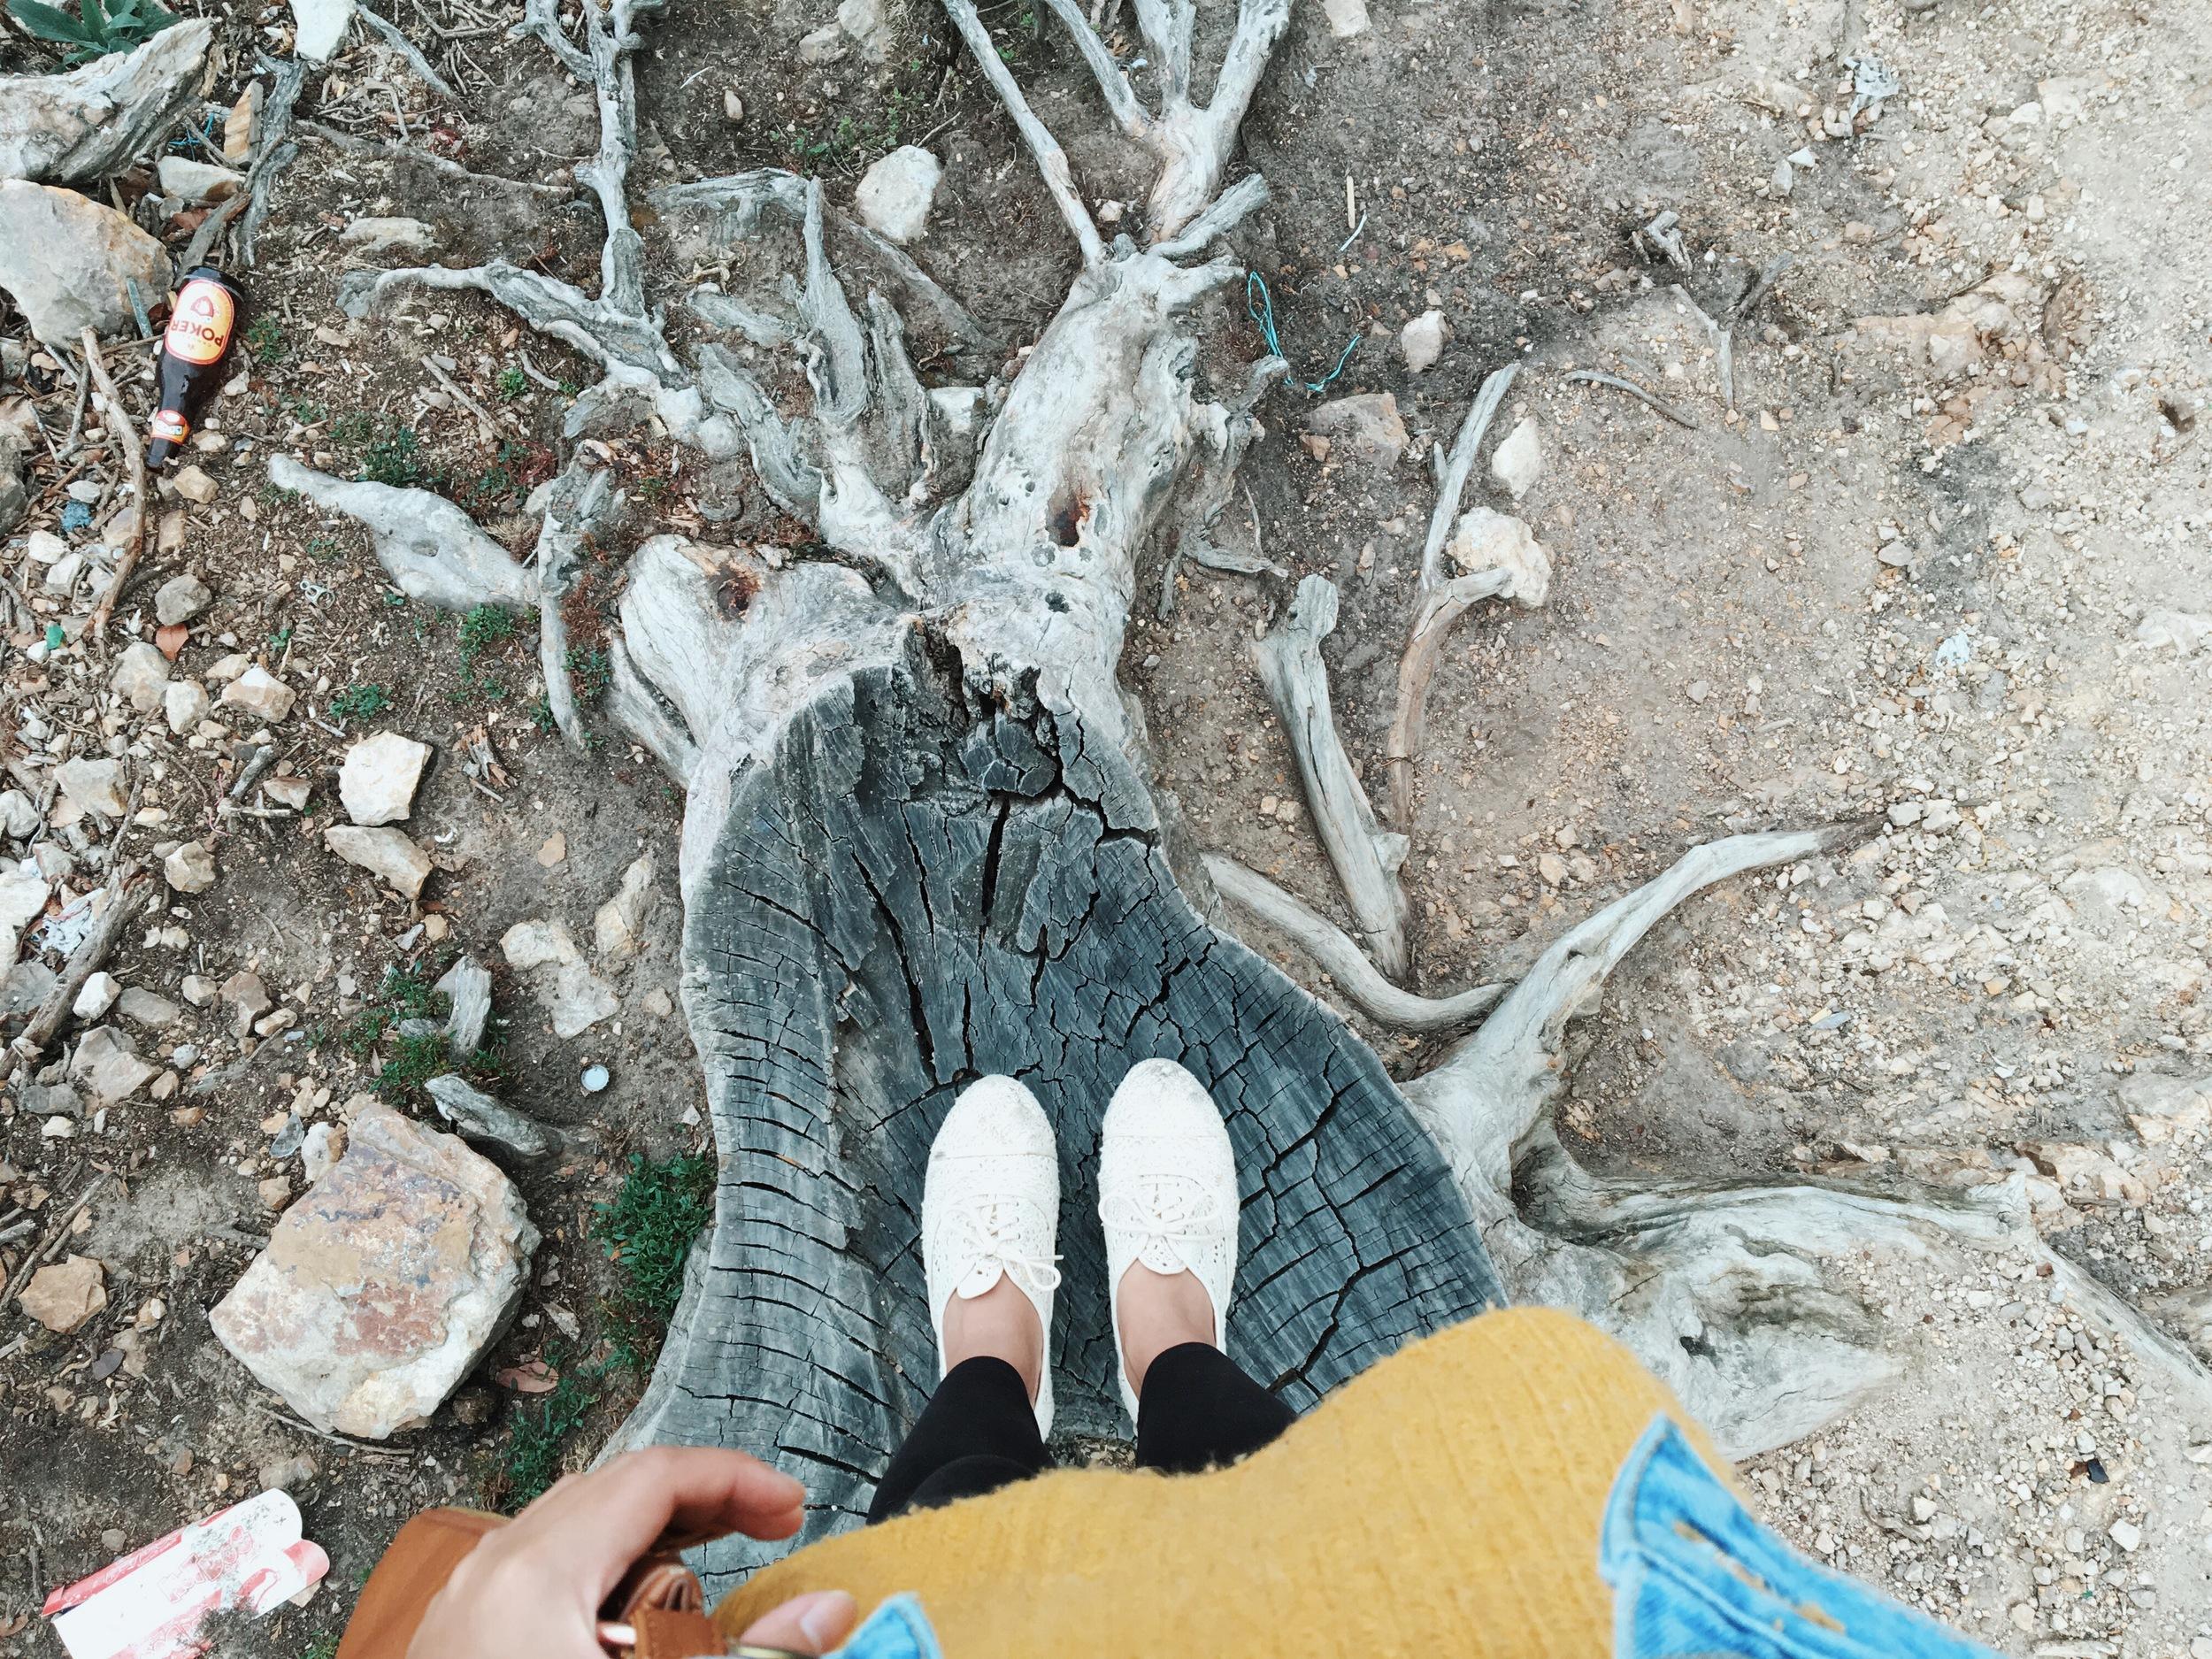 from where I stood on a tree stump